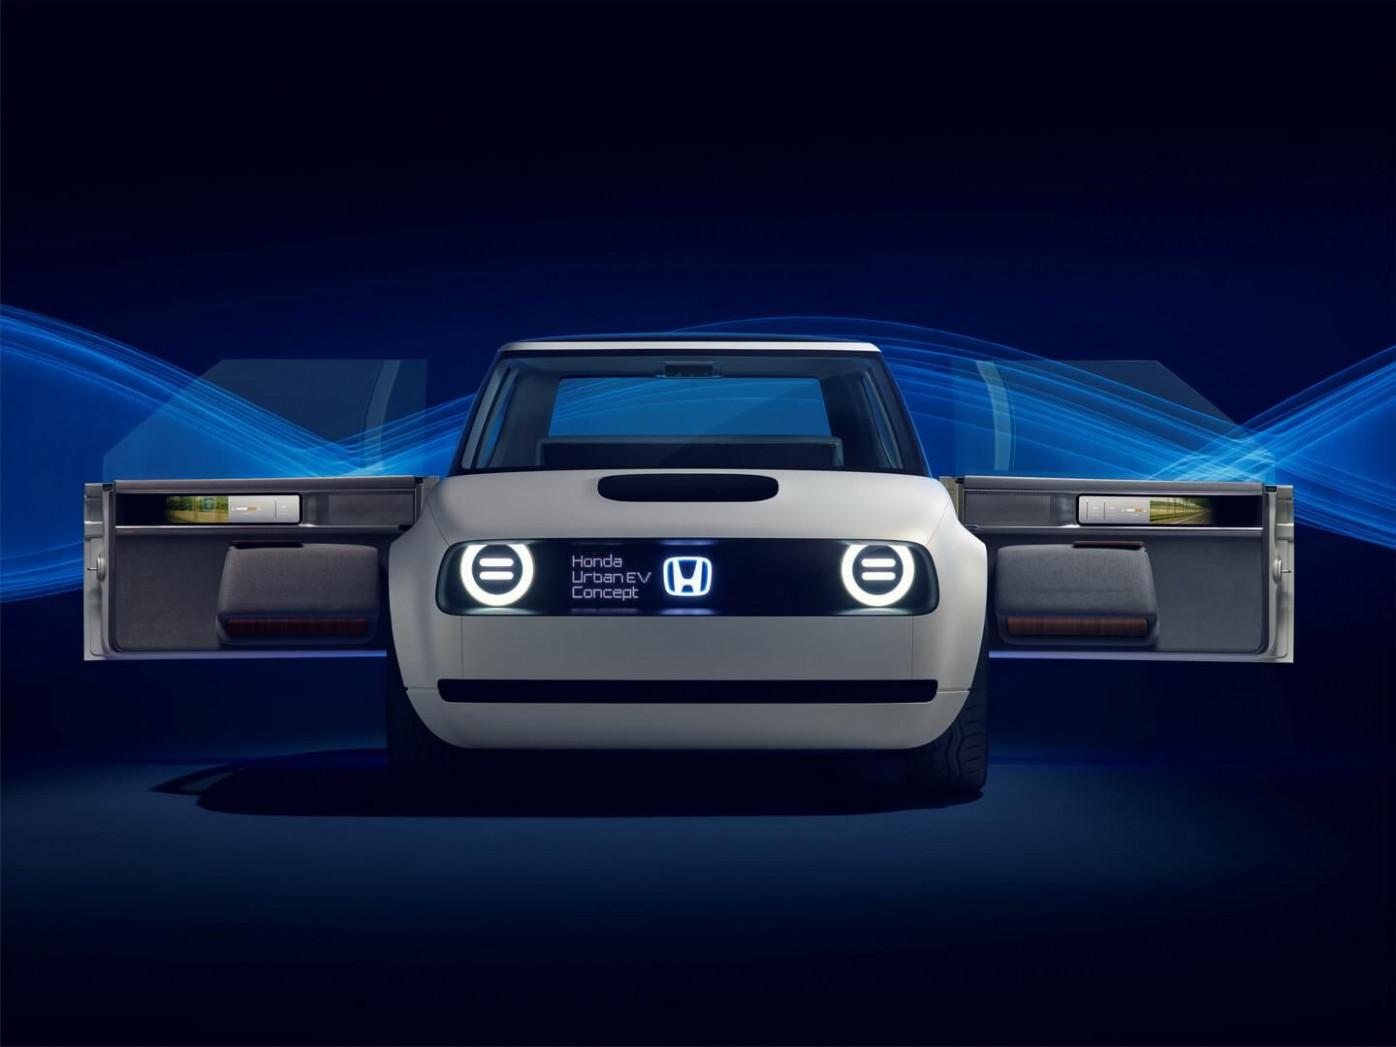 Overview 2022 Honda Urban